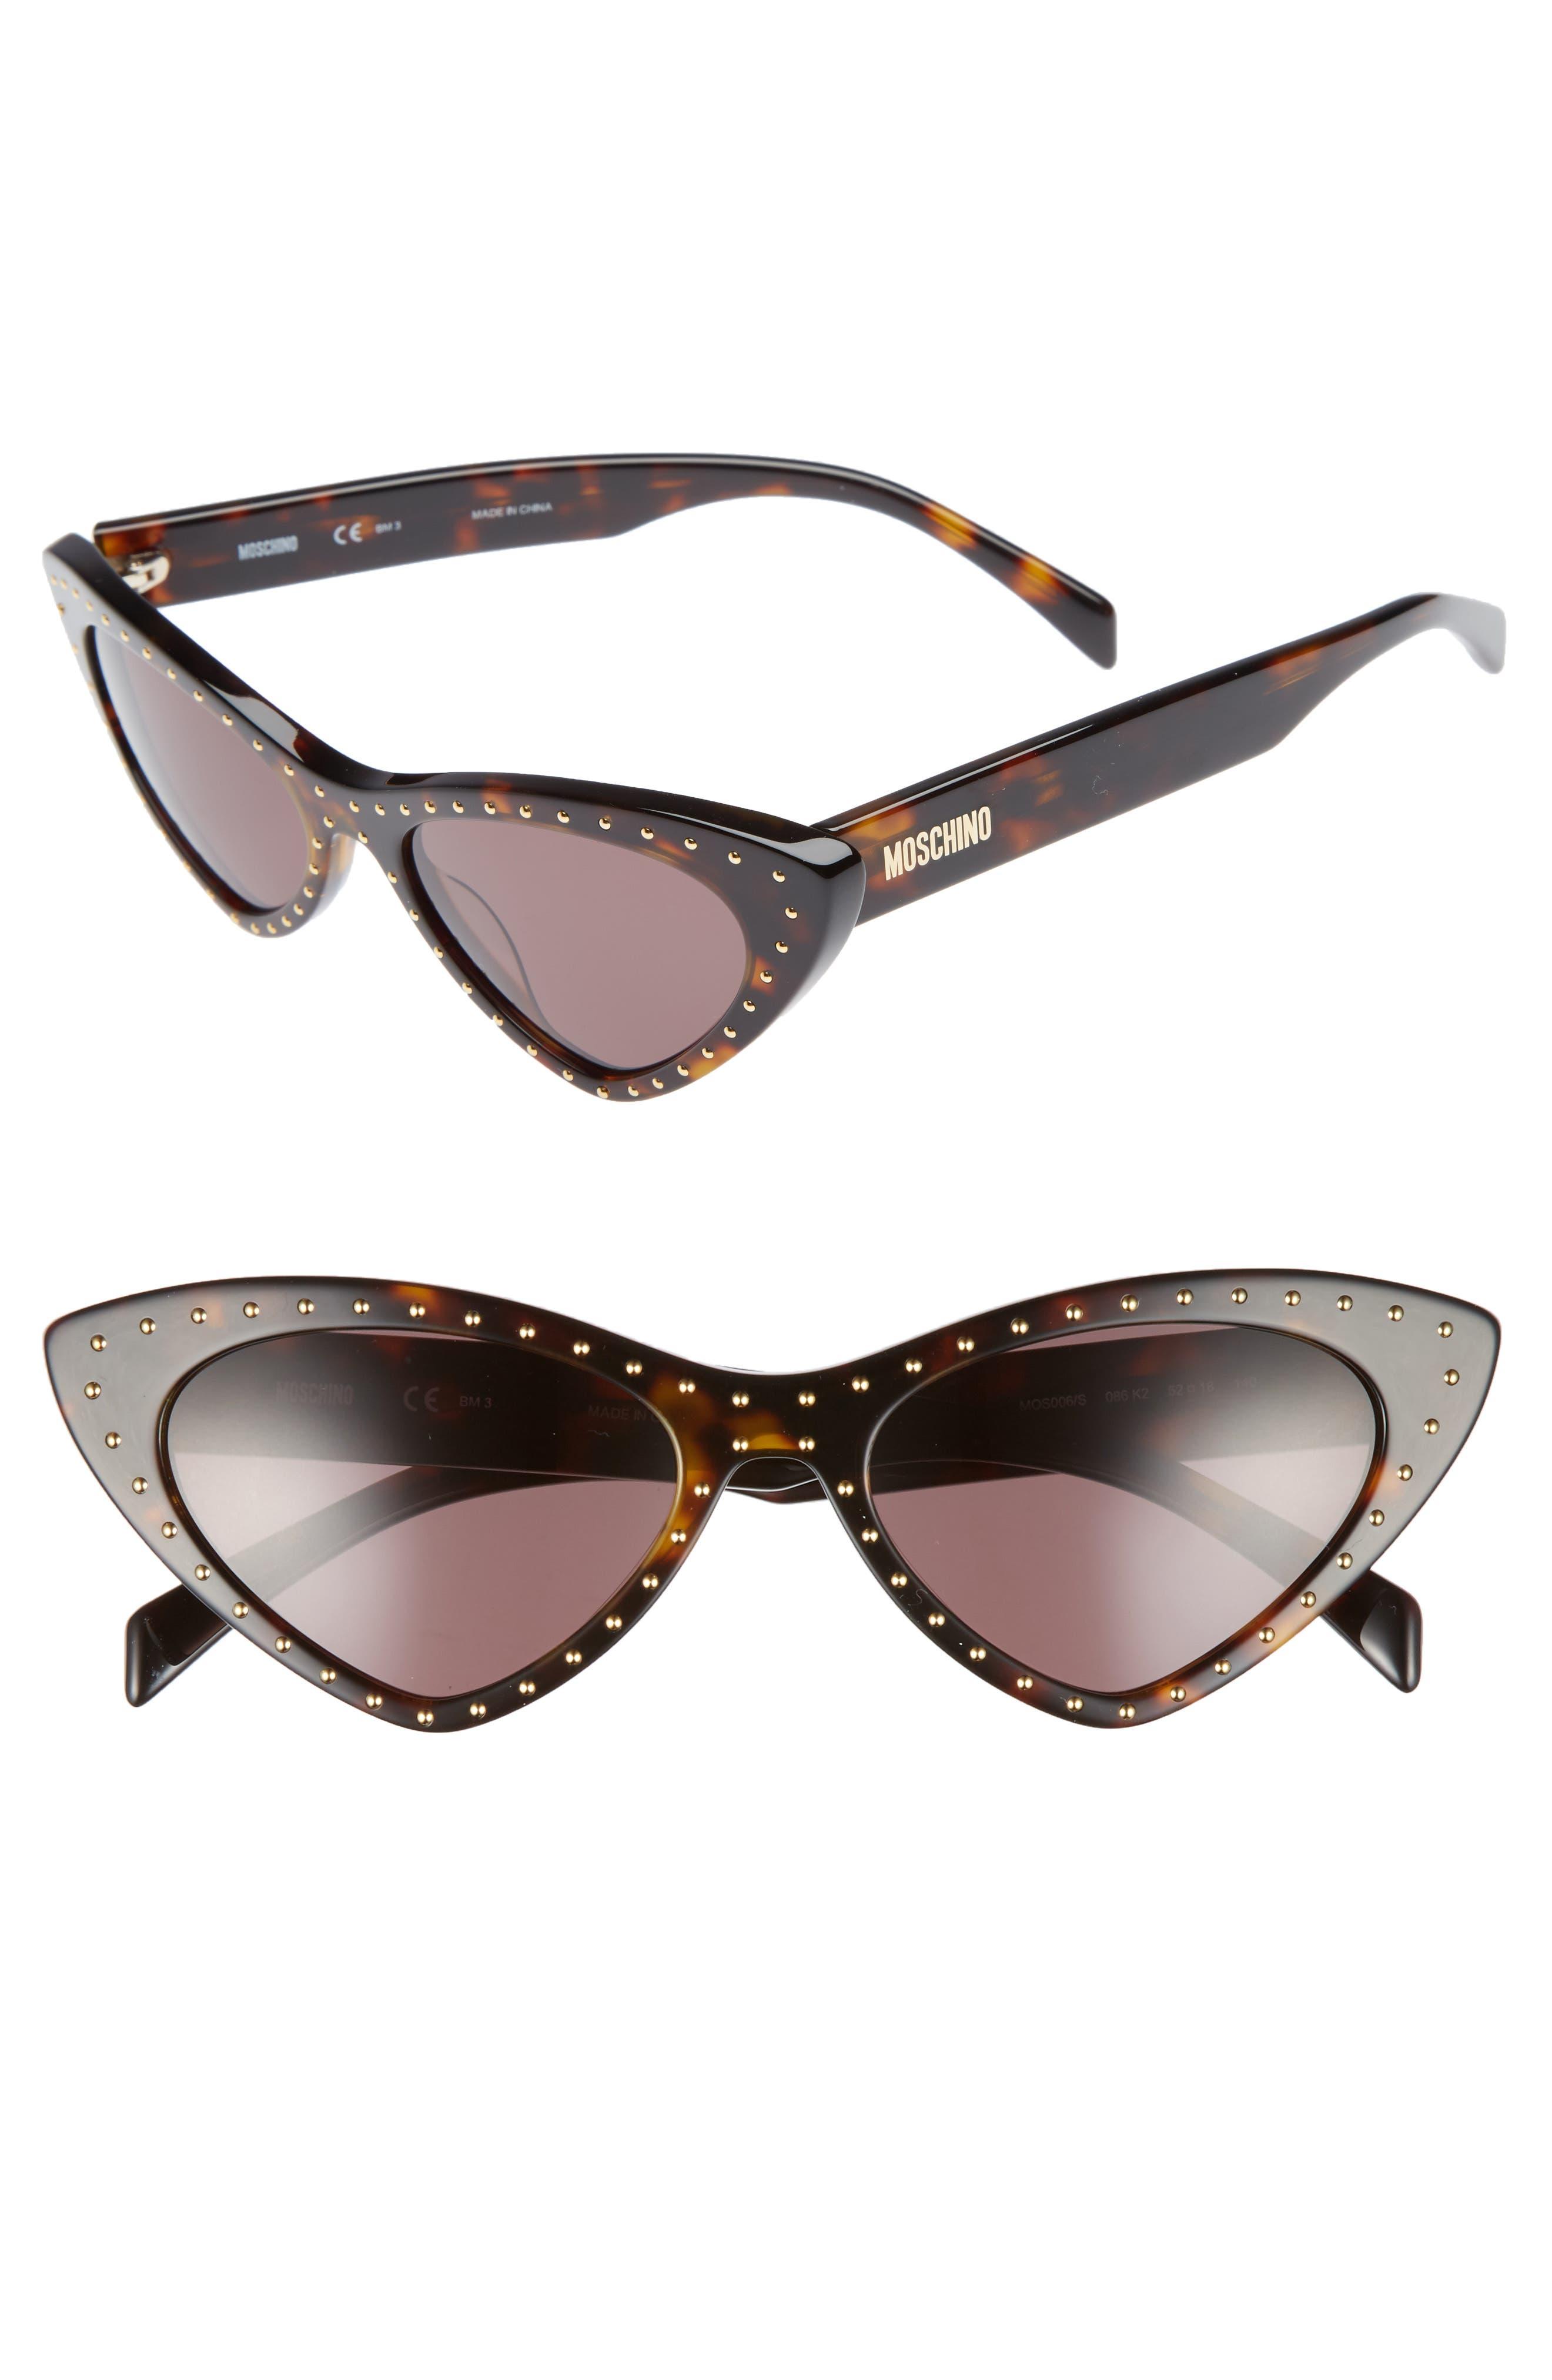 52mm Cat's Eye Sunglasses,                         Main,                         color, Dark Havana